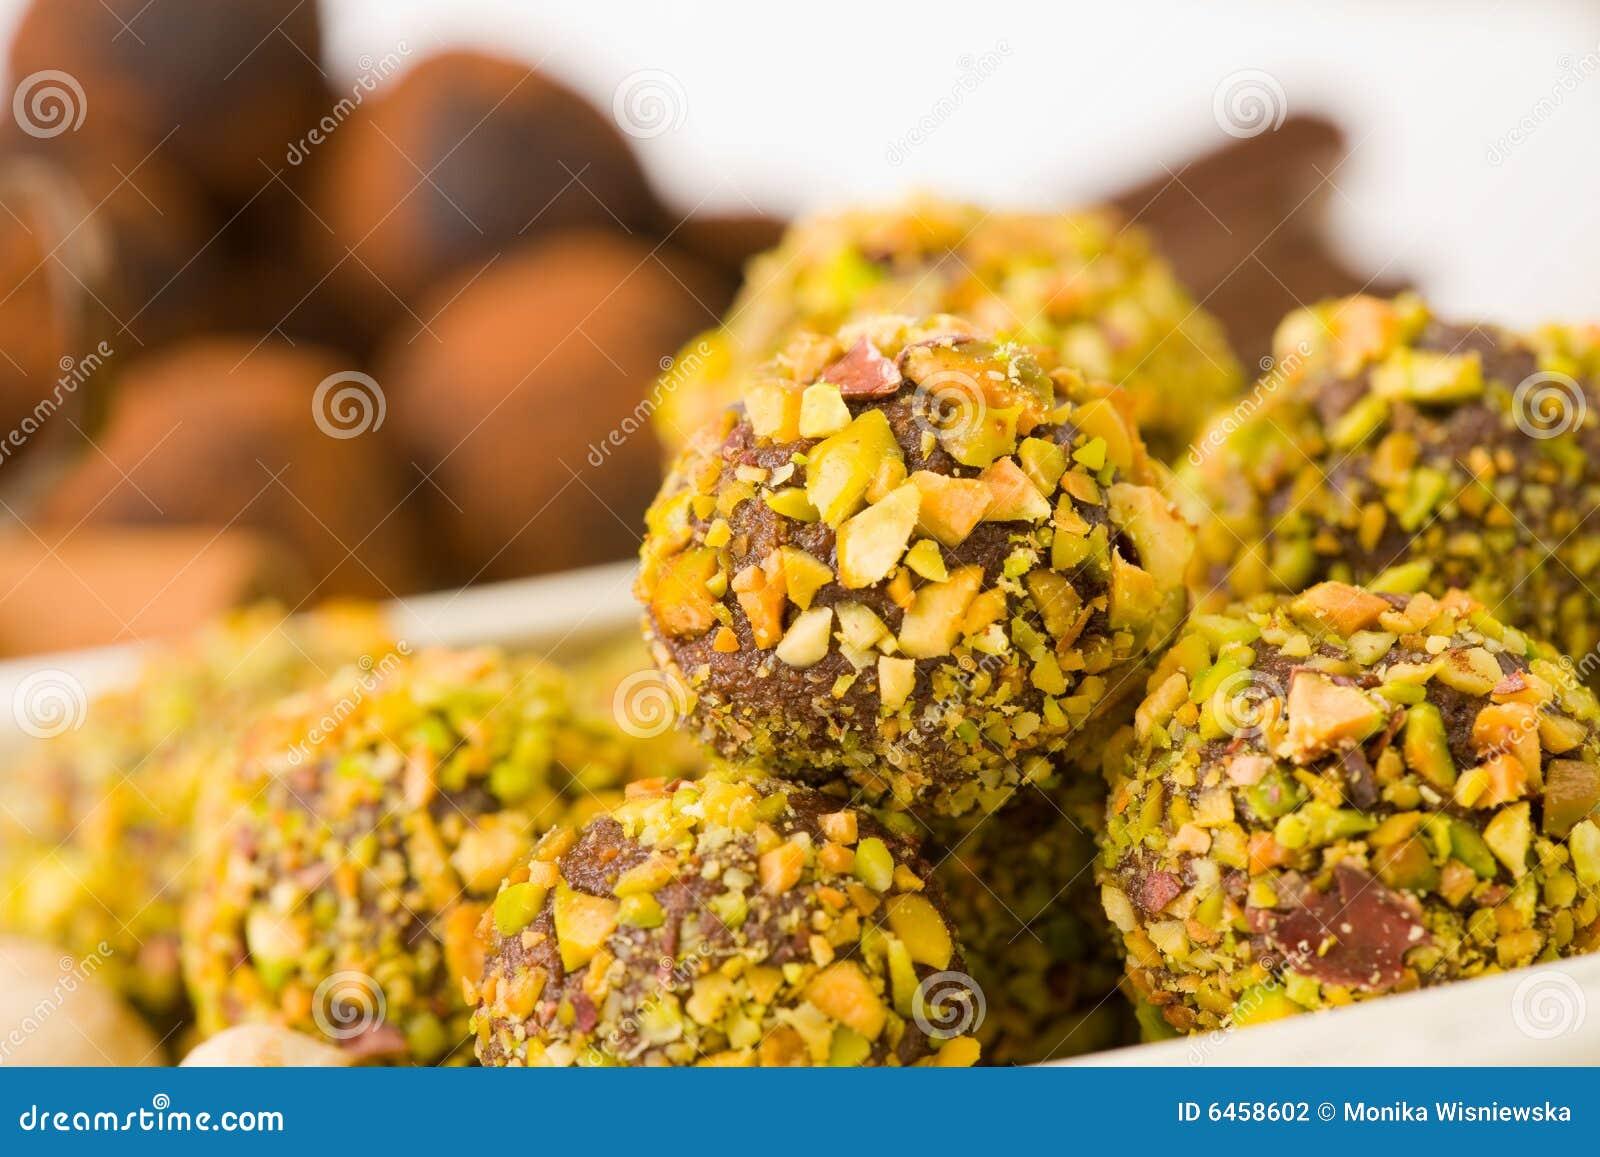 Chocolates Handmade